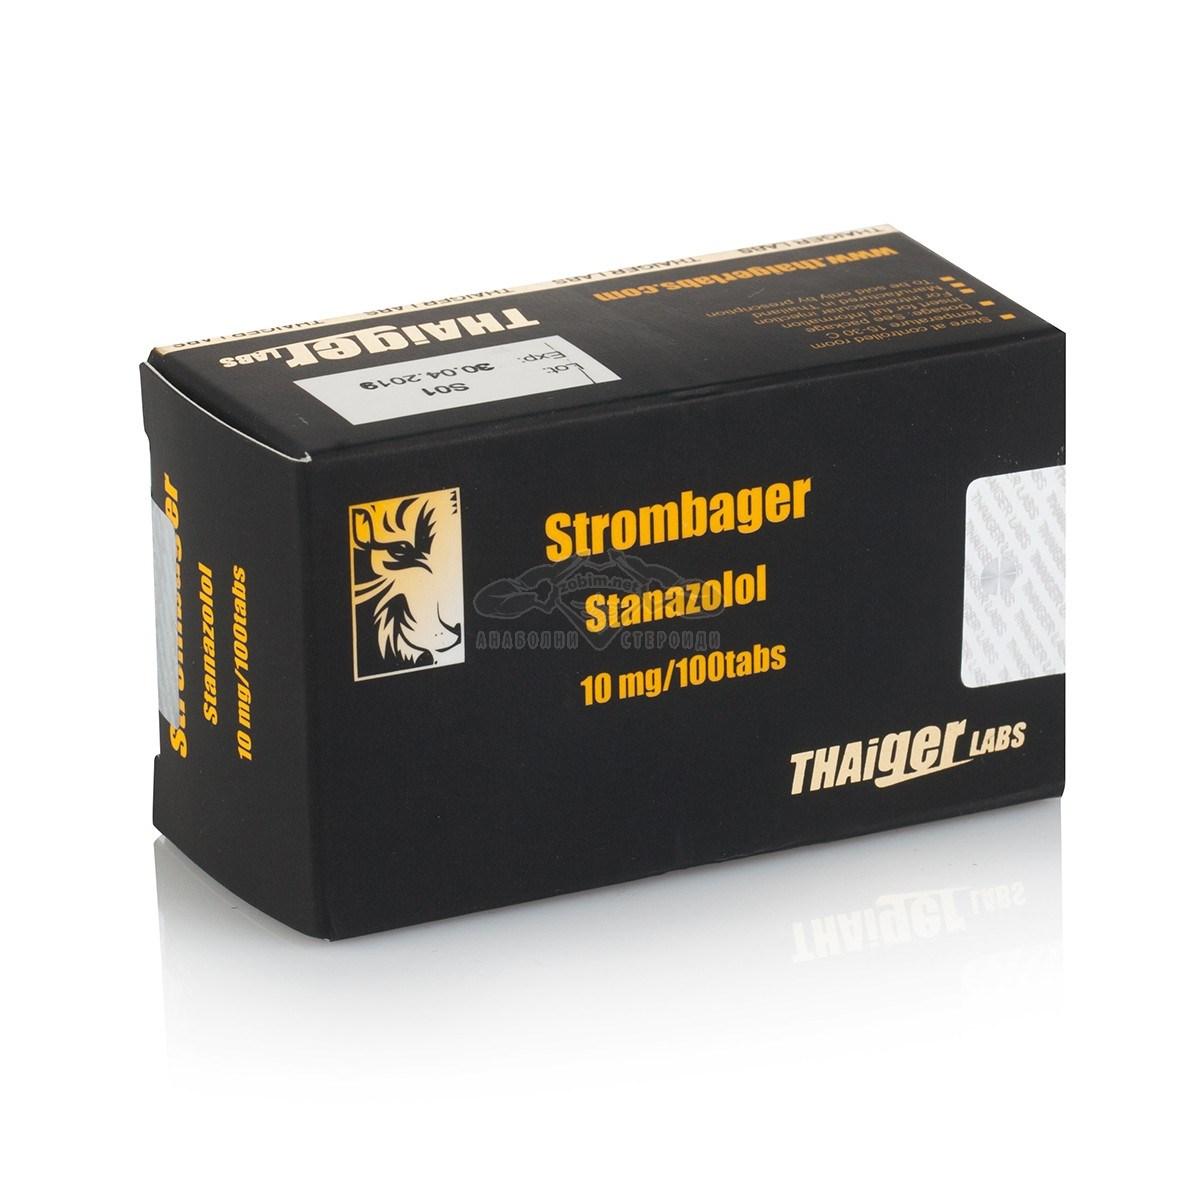 Strombager (Stanozolol) – 100 табл. х 10 мг.